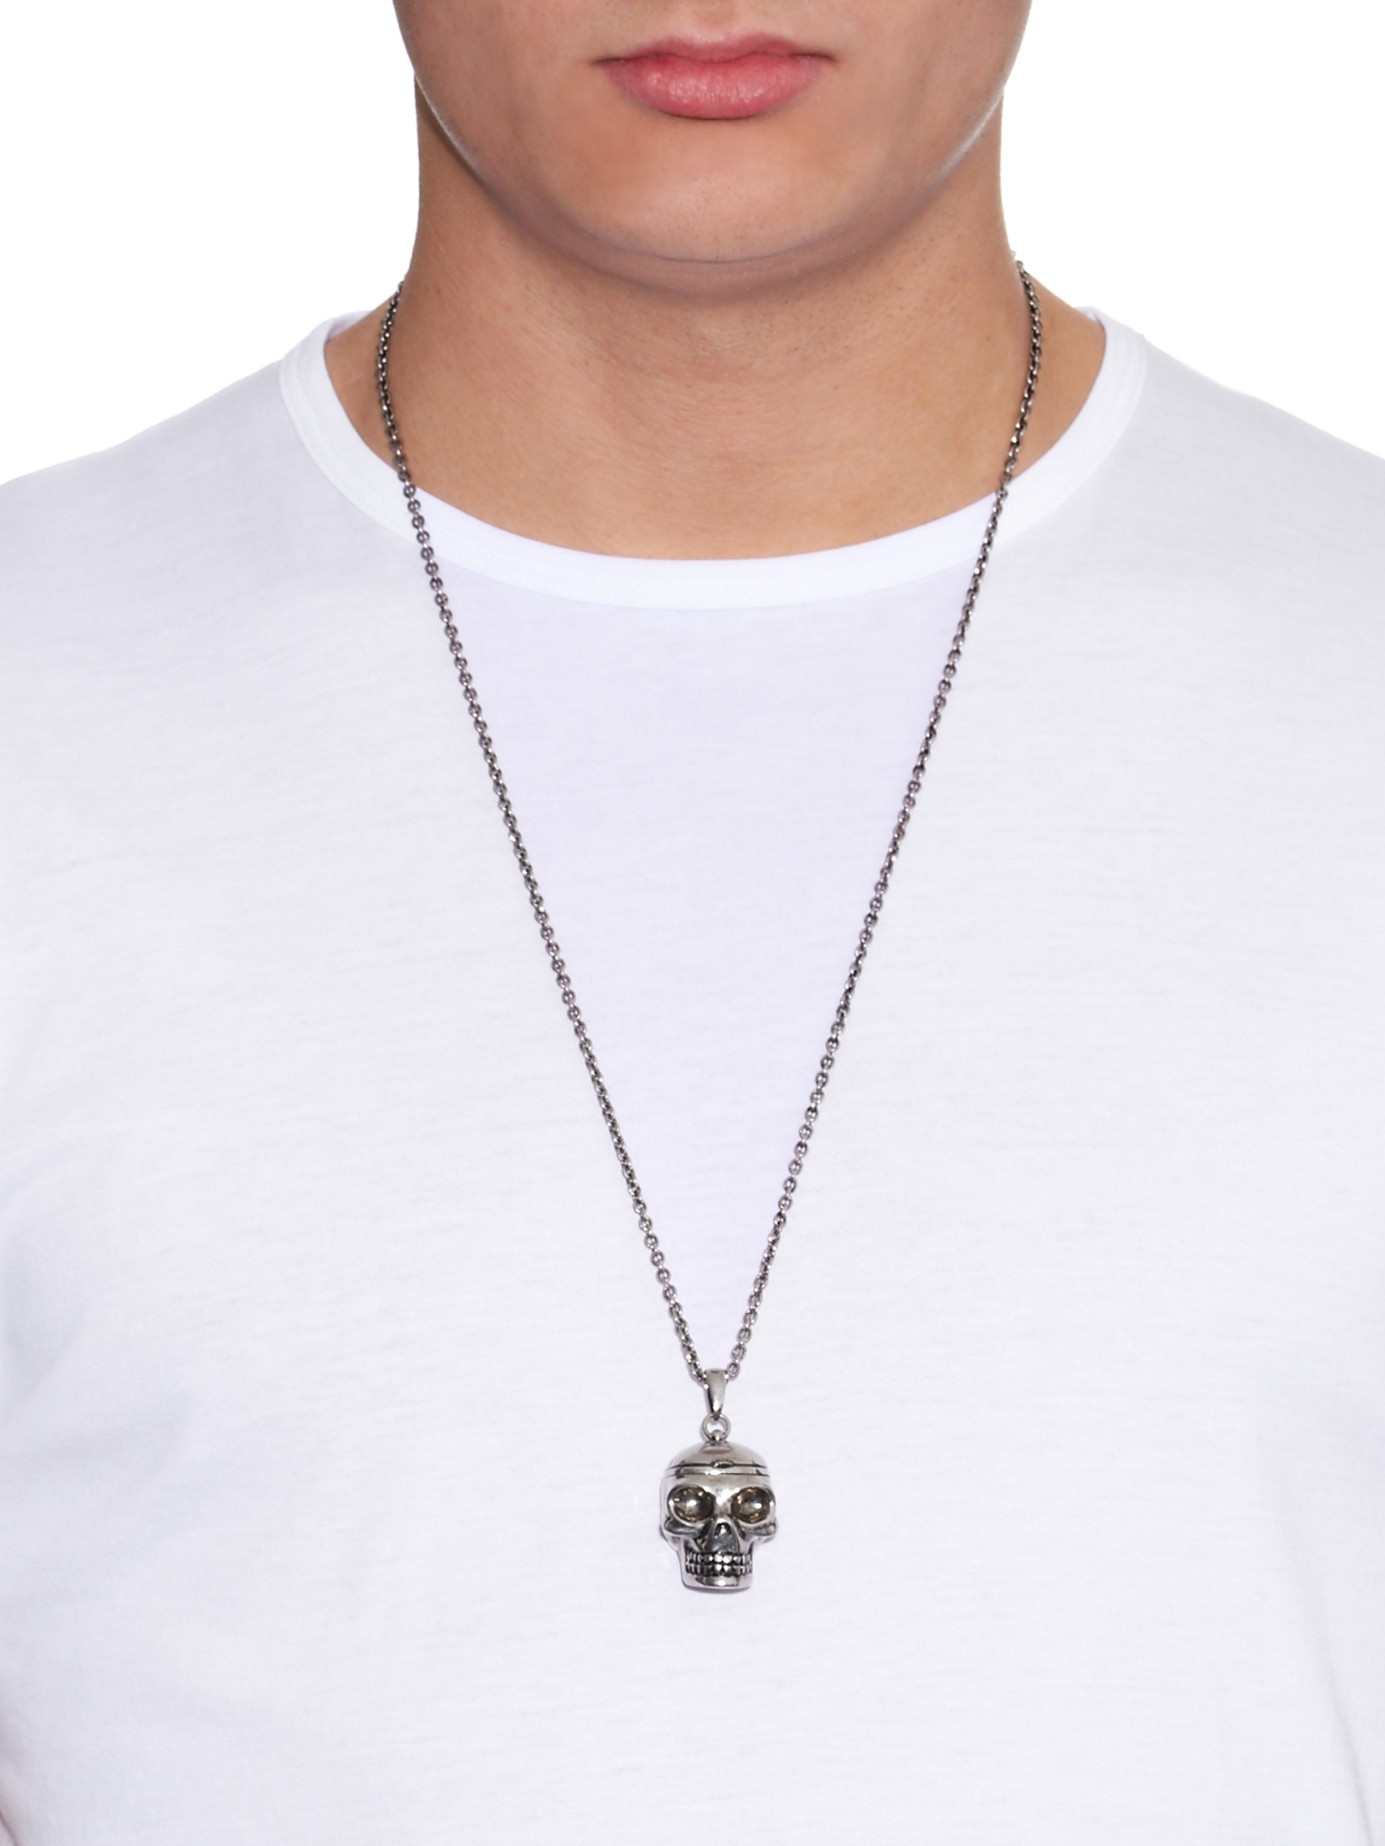 Lyst Alexander Mcqueen Silvertone Palladio Skull Necklace in